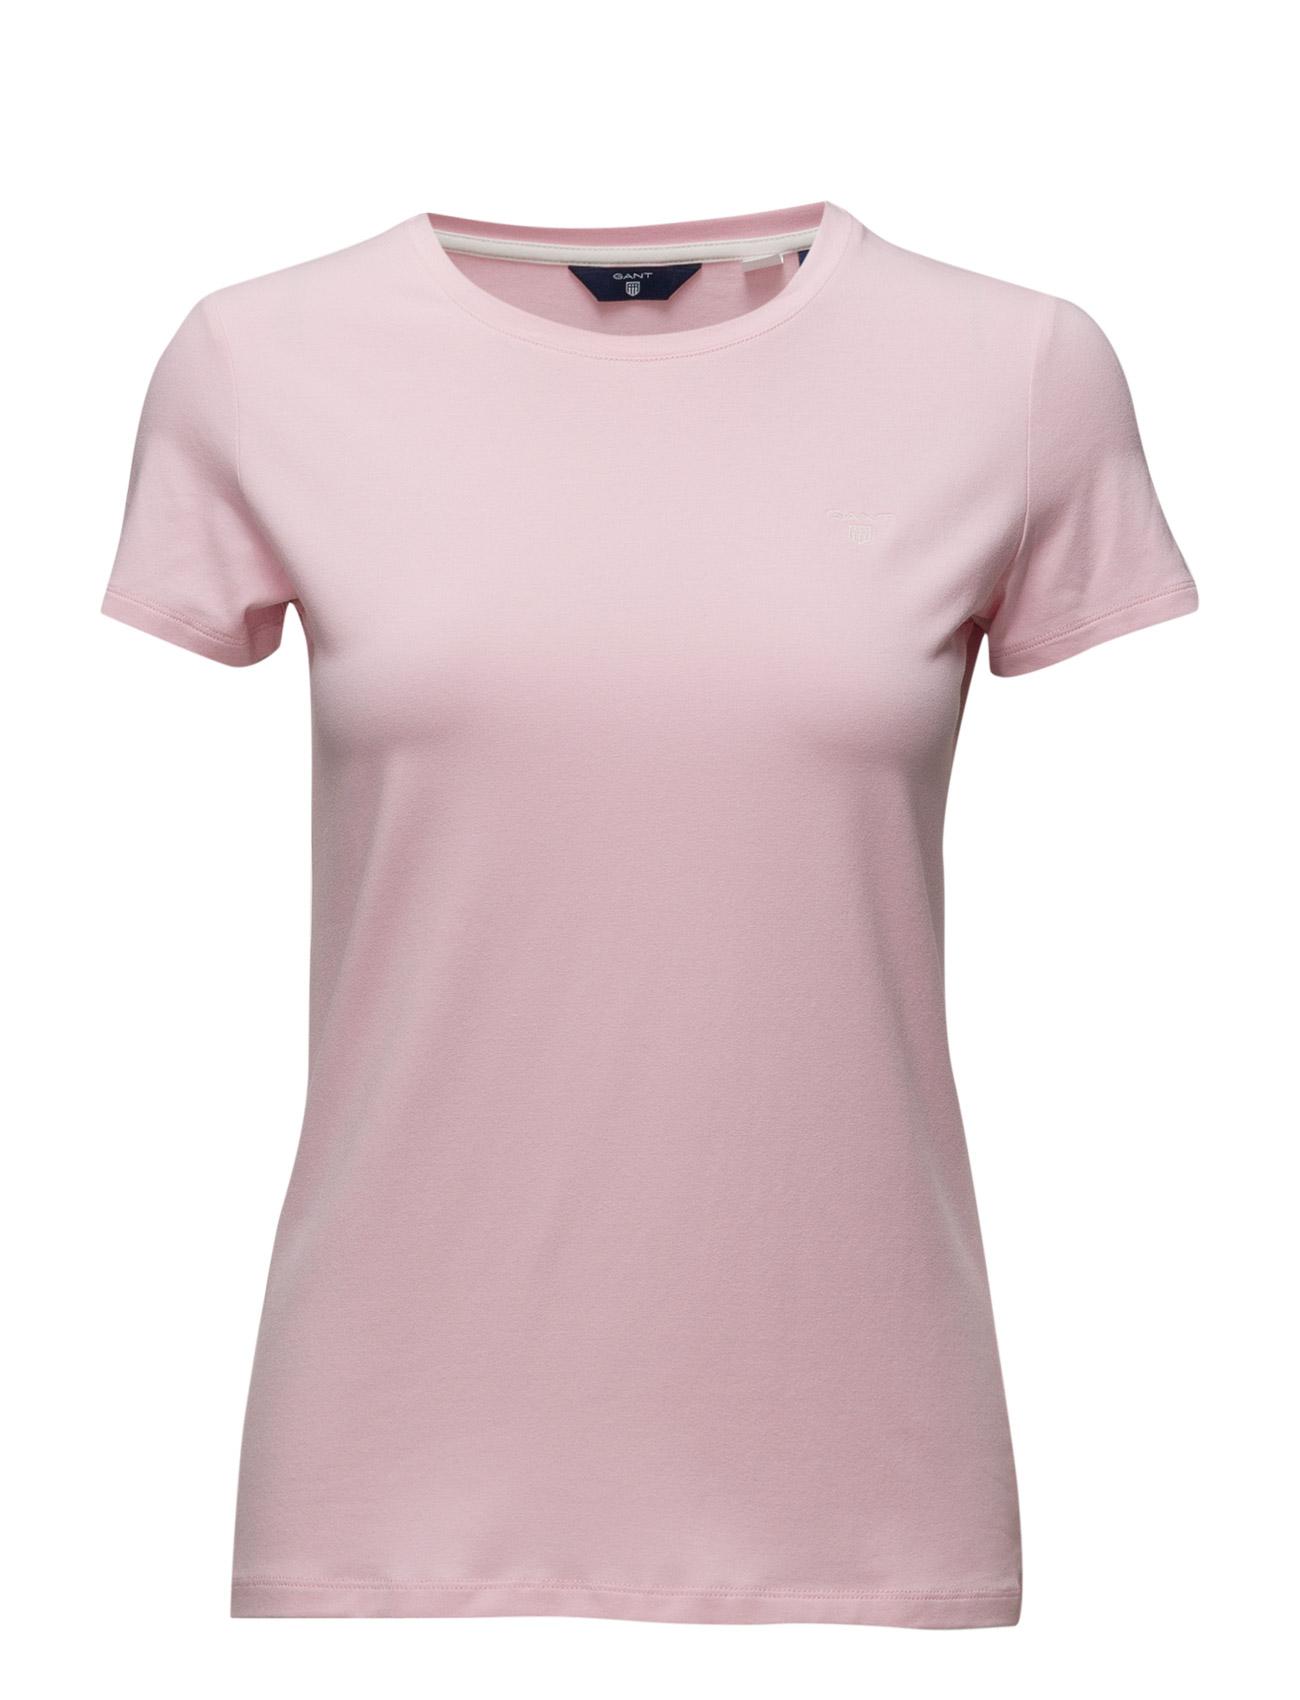 Cott/Ela C-Neck Ss T-Shirt